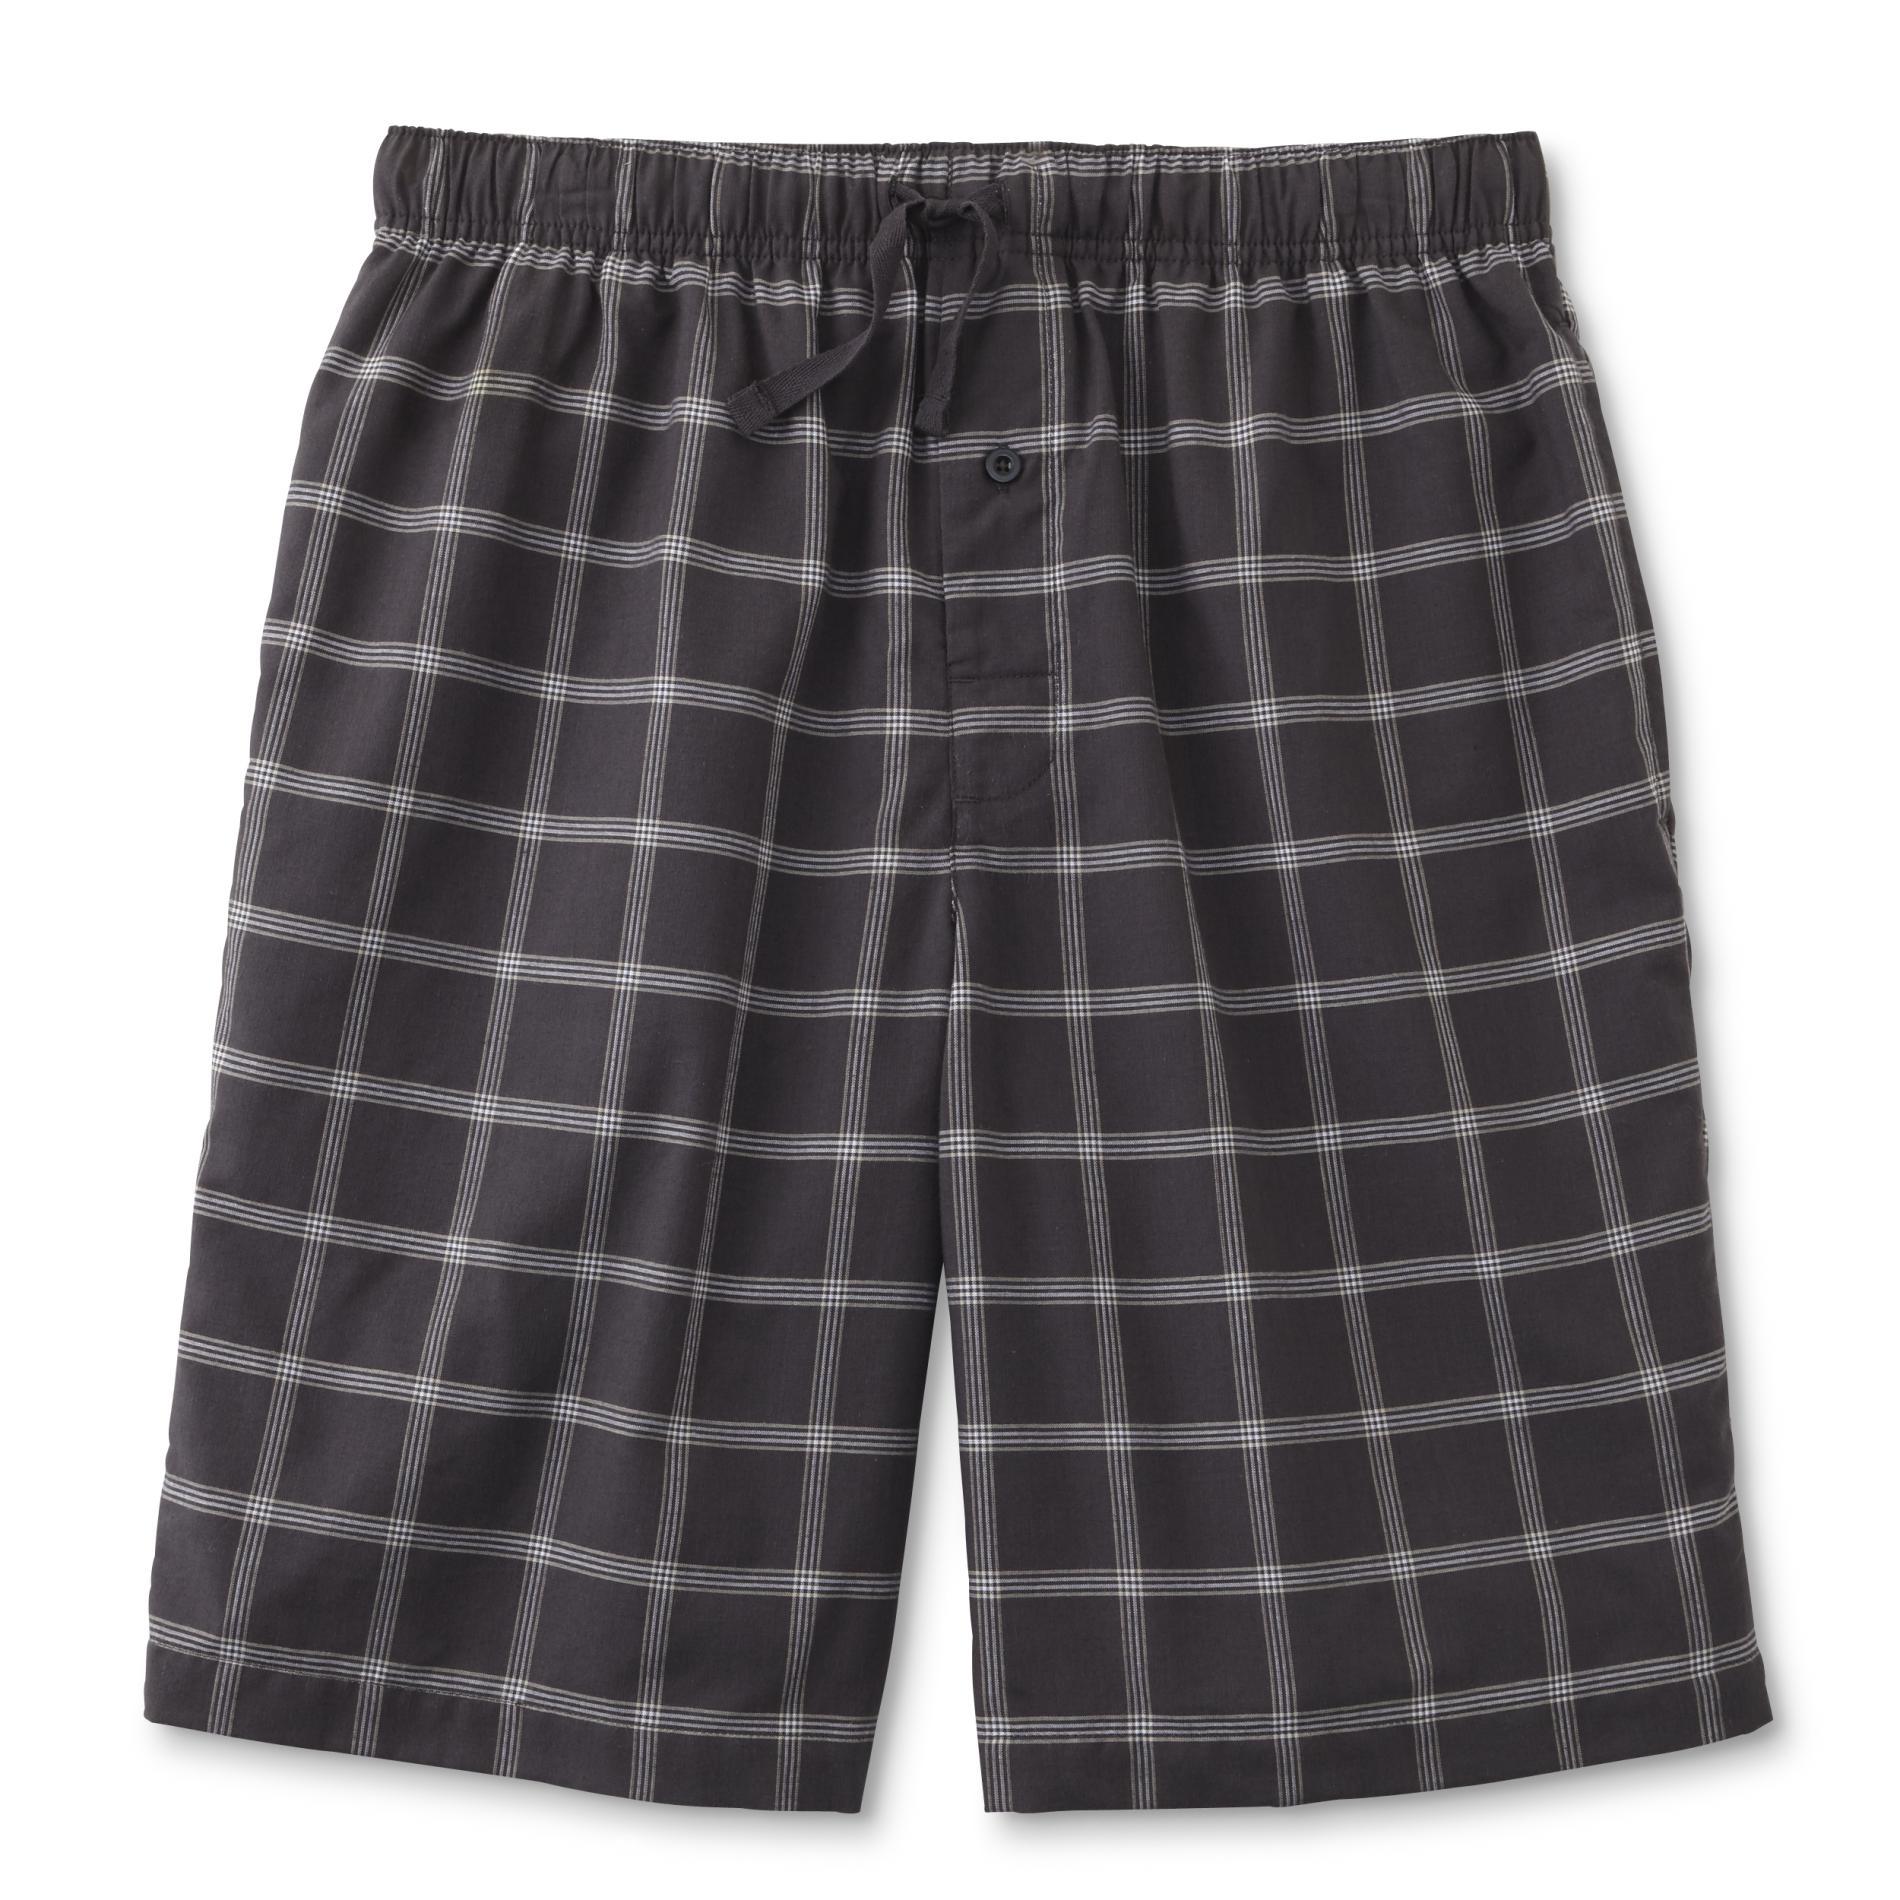 Basic Editions Men's Big & Tall Poplin Sleep Shorts - Plaid PartNumber: 046VA87874612P MfgPartNumber: MU6BE42902 - MAS